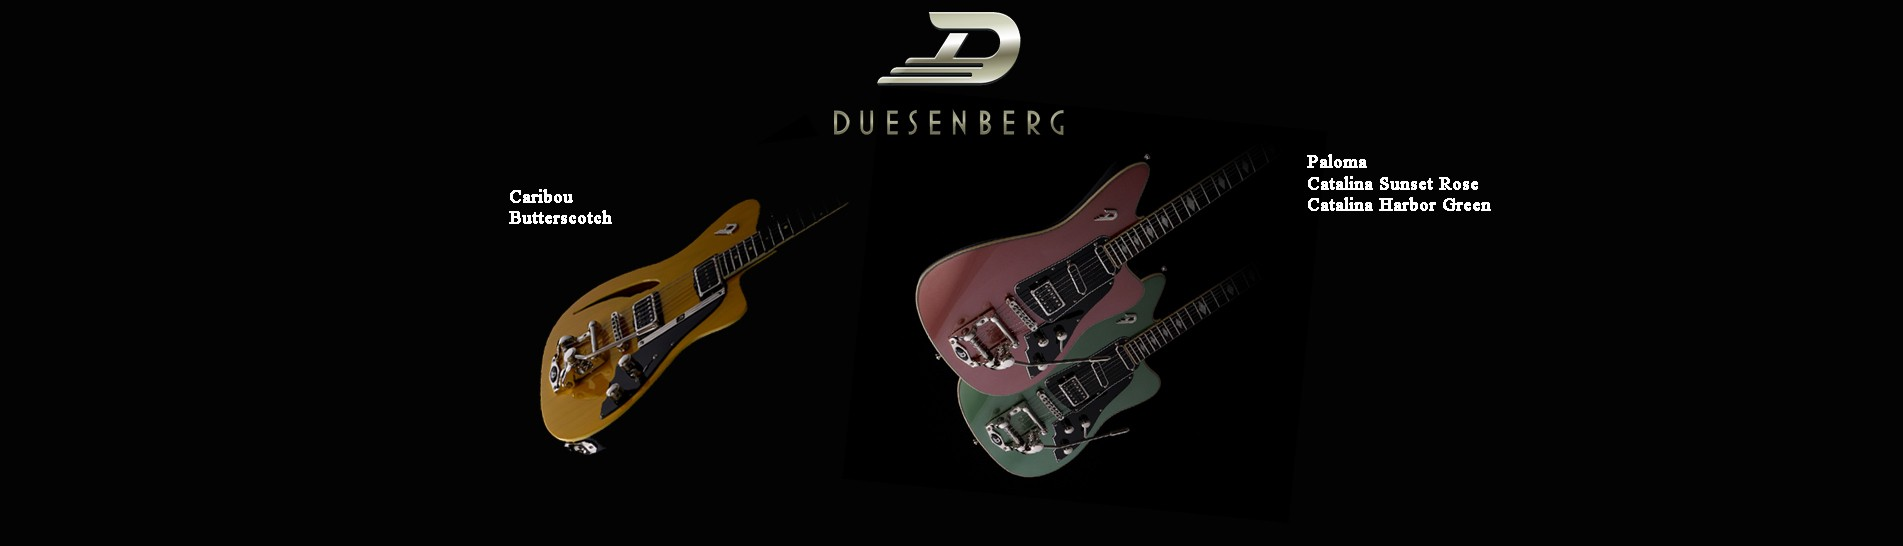 Guitare Duesenberg bauer musique